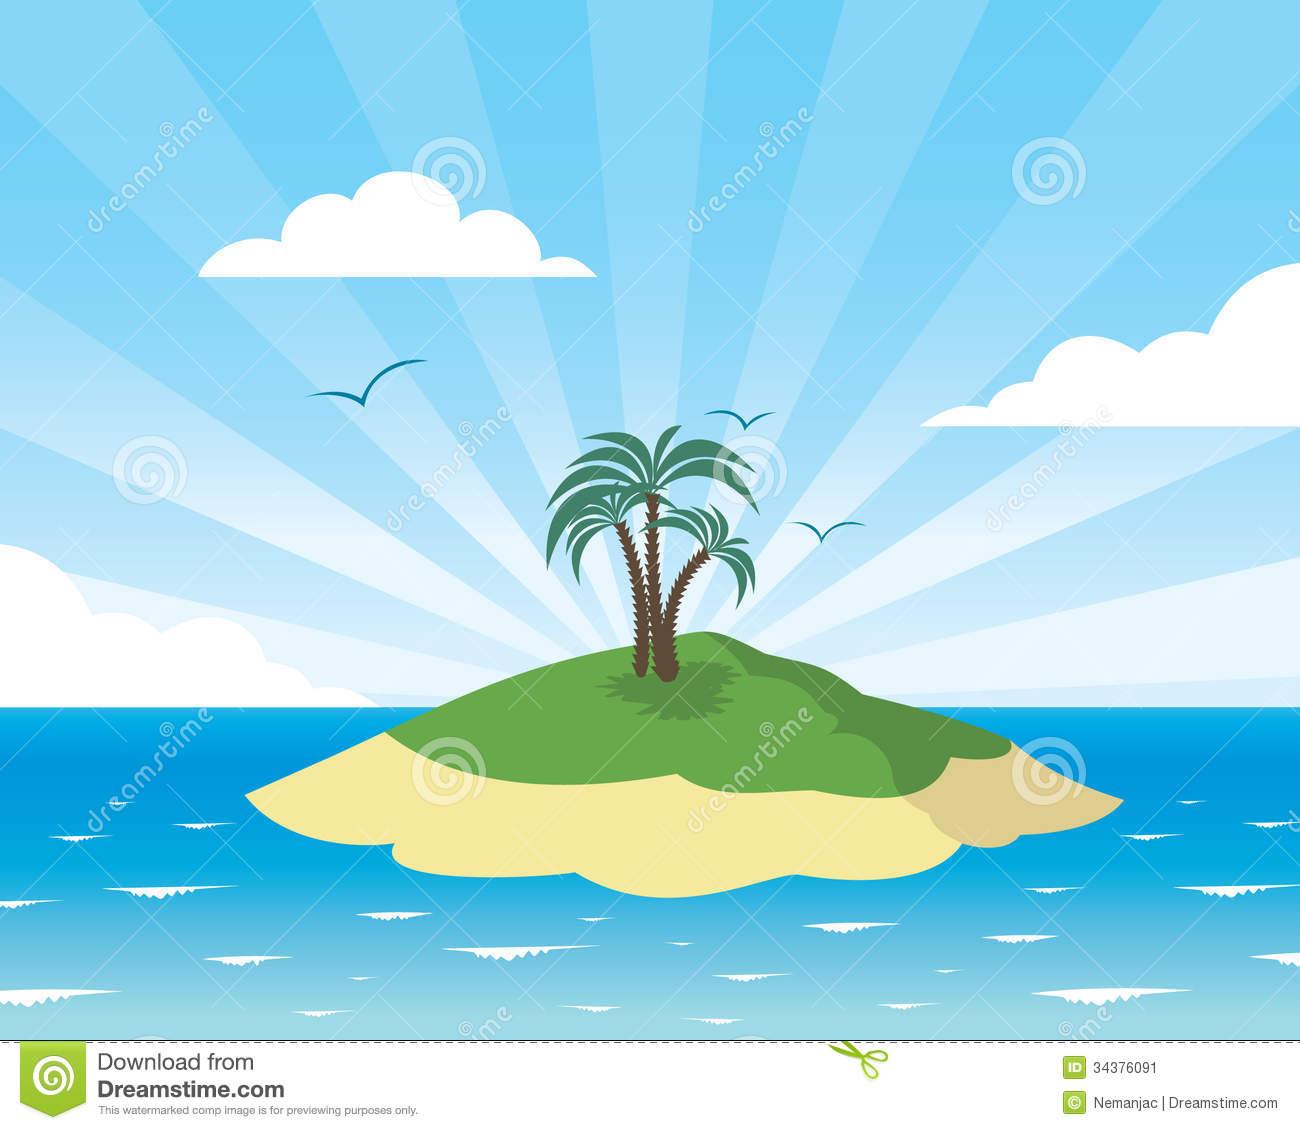 Image Gallery island paradise cartoon